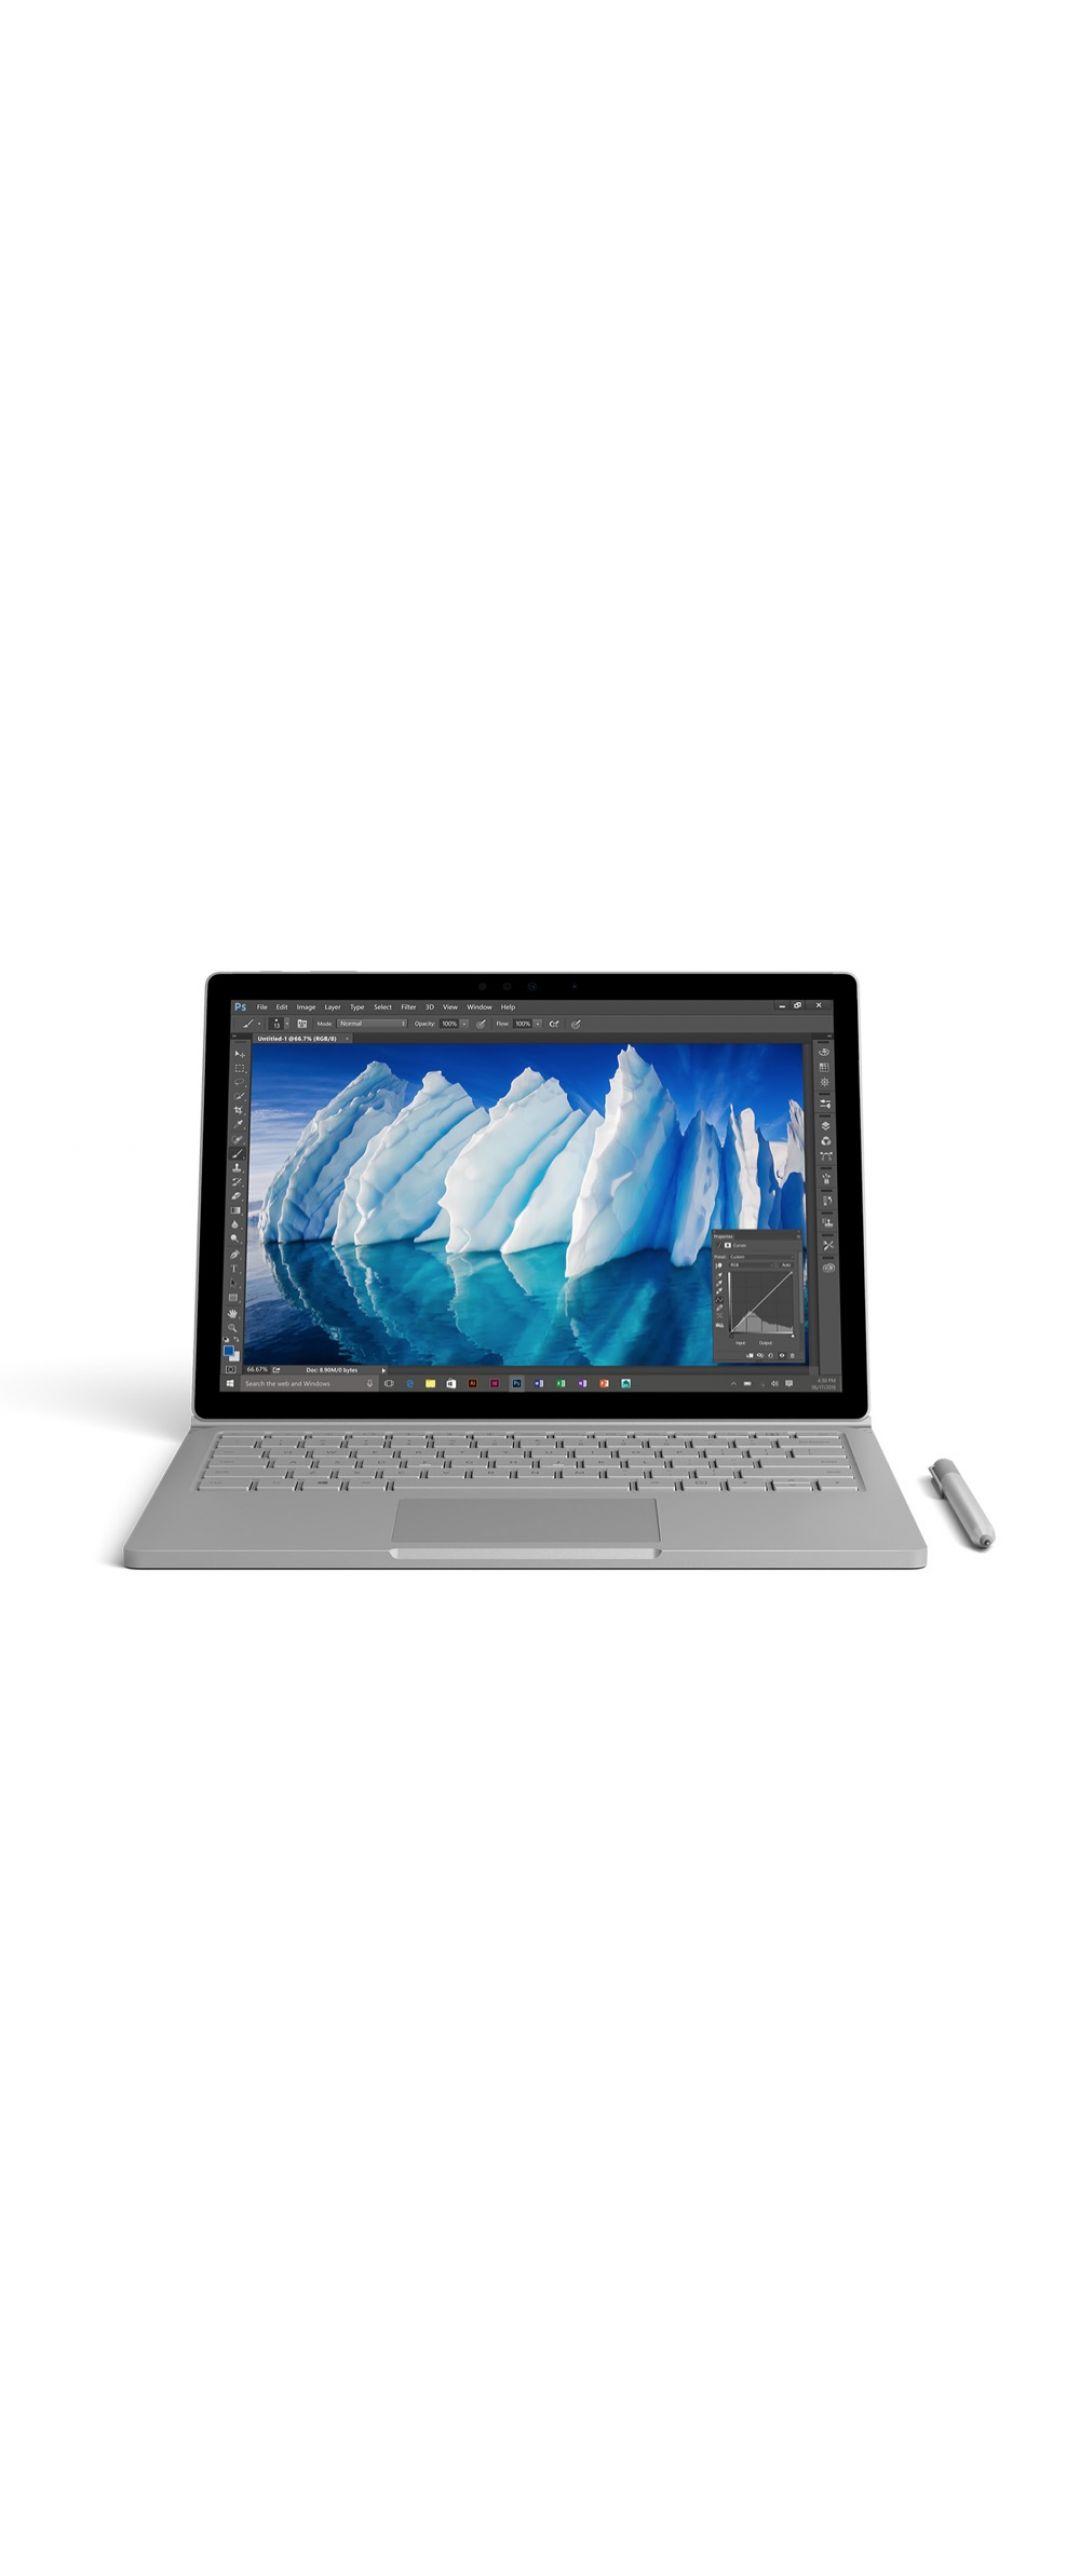 Microsoft presenta su nueva Surface Book i7 #MicrosoftEvent